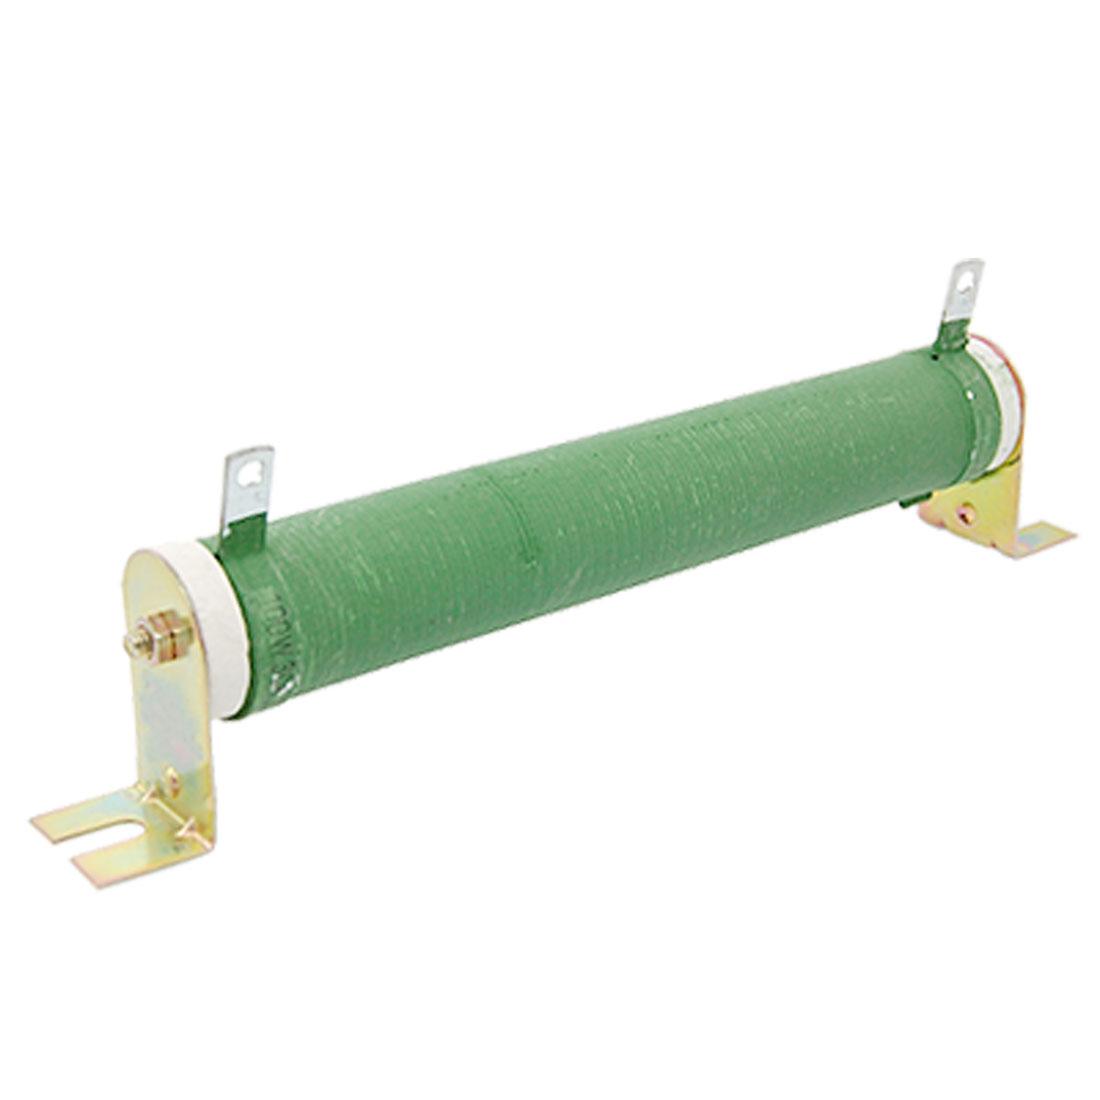 50 ohm 100 Watts High Power Ceramic Tube Resistor 100W